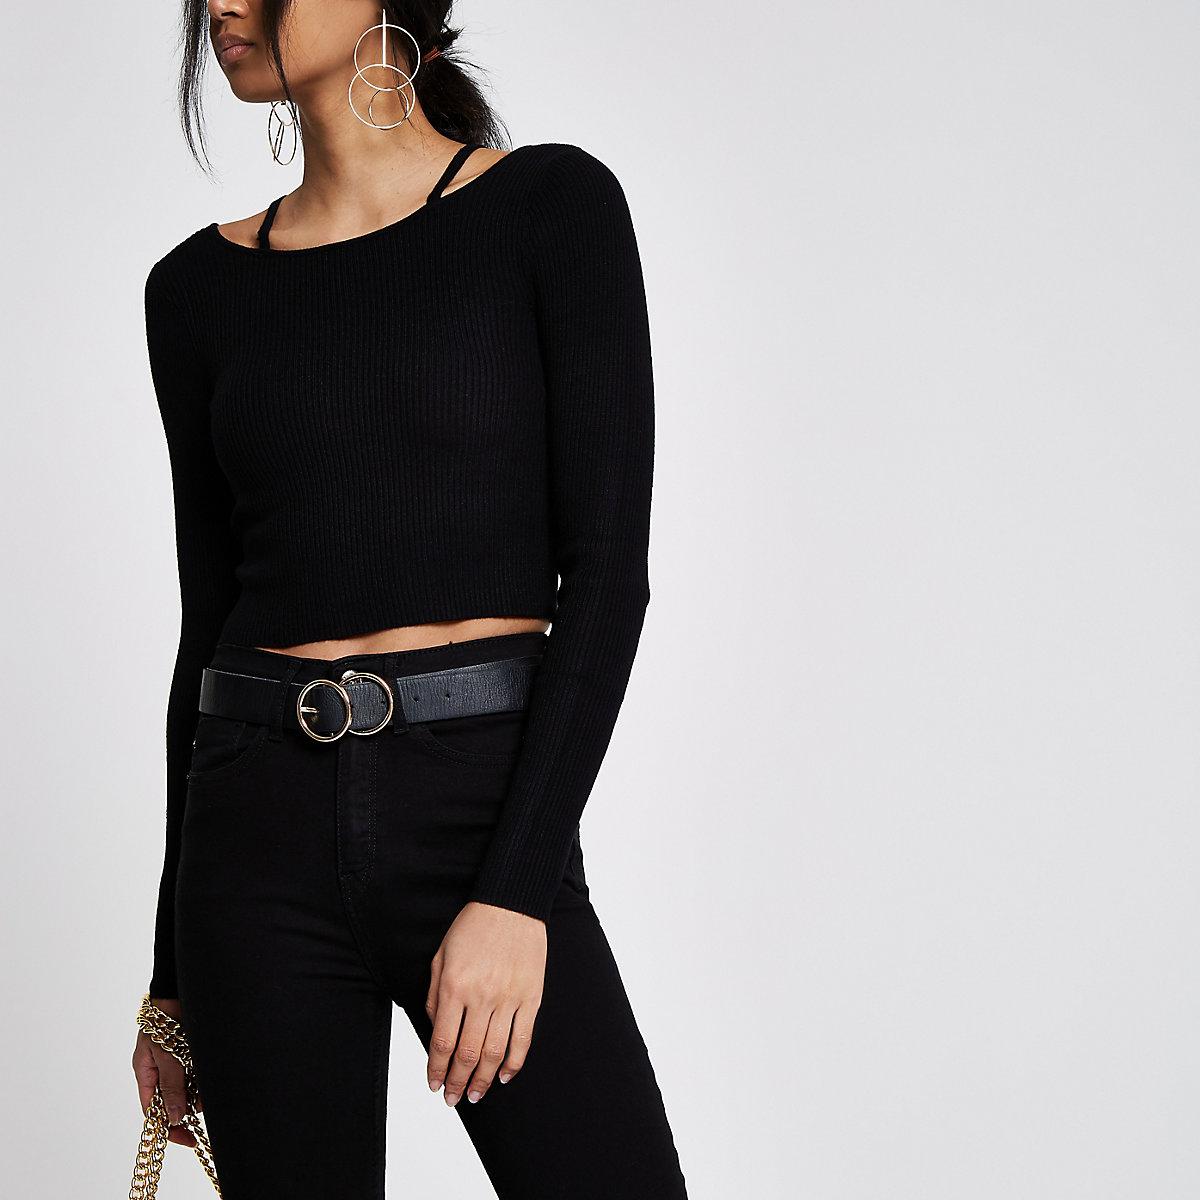 Black rib knit strappy detail crop top